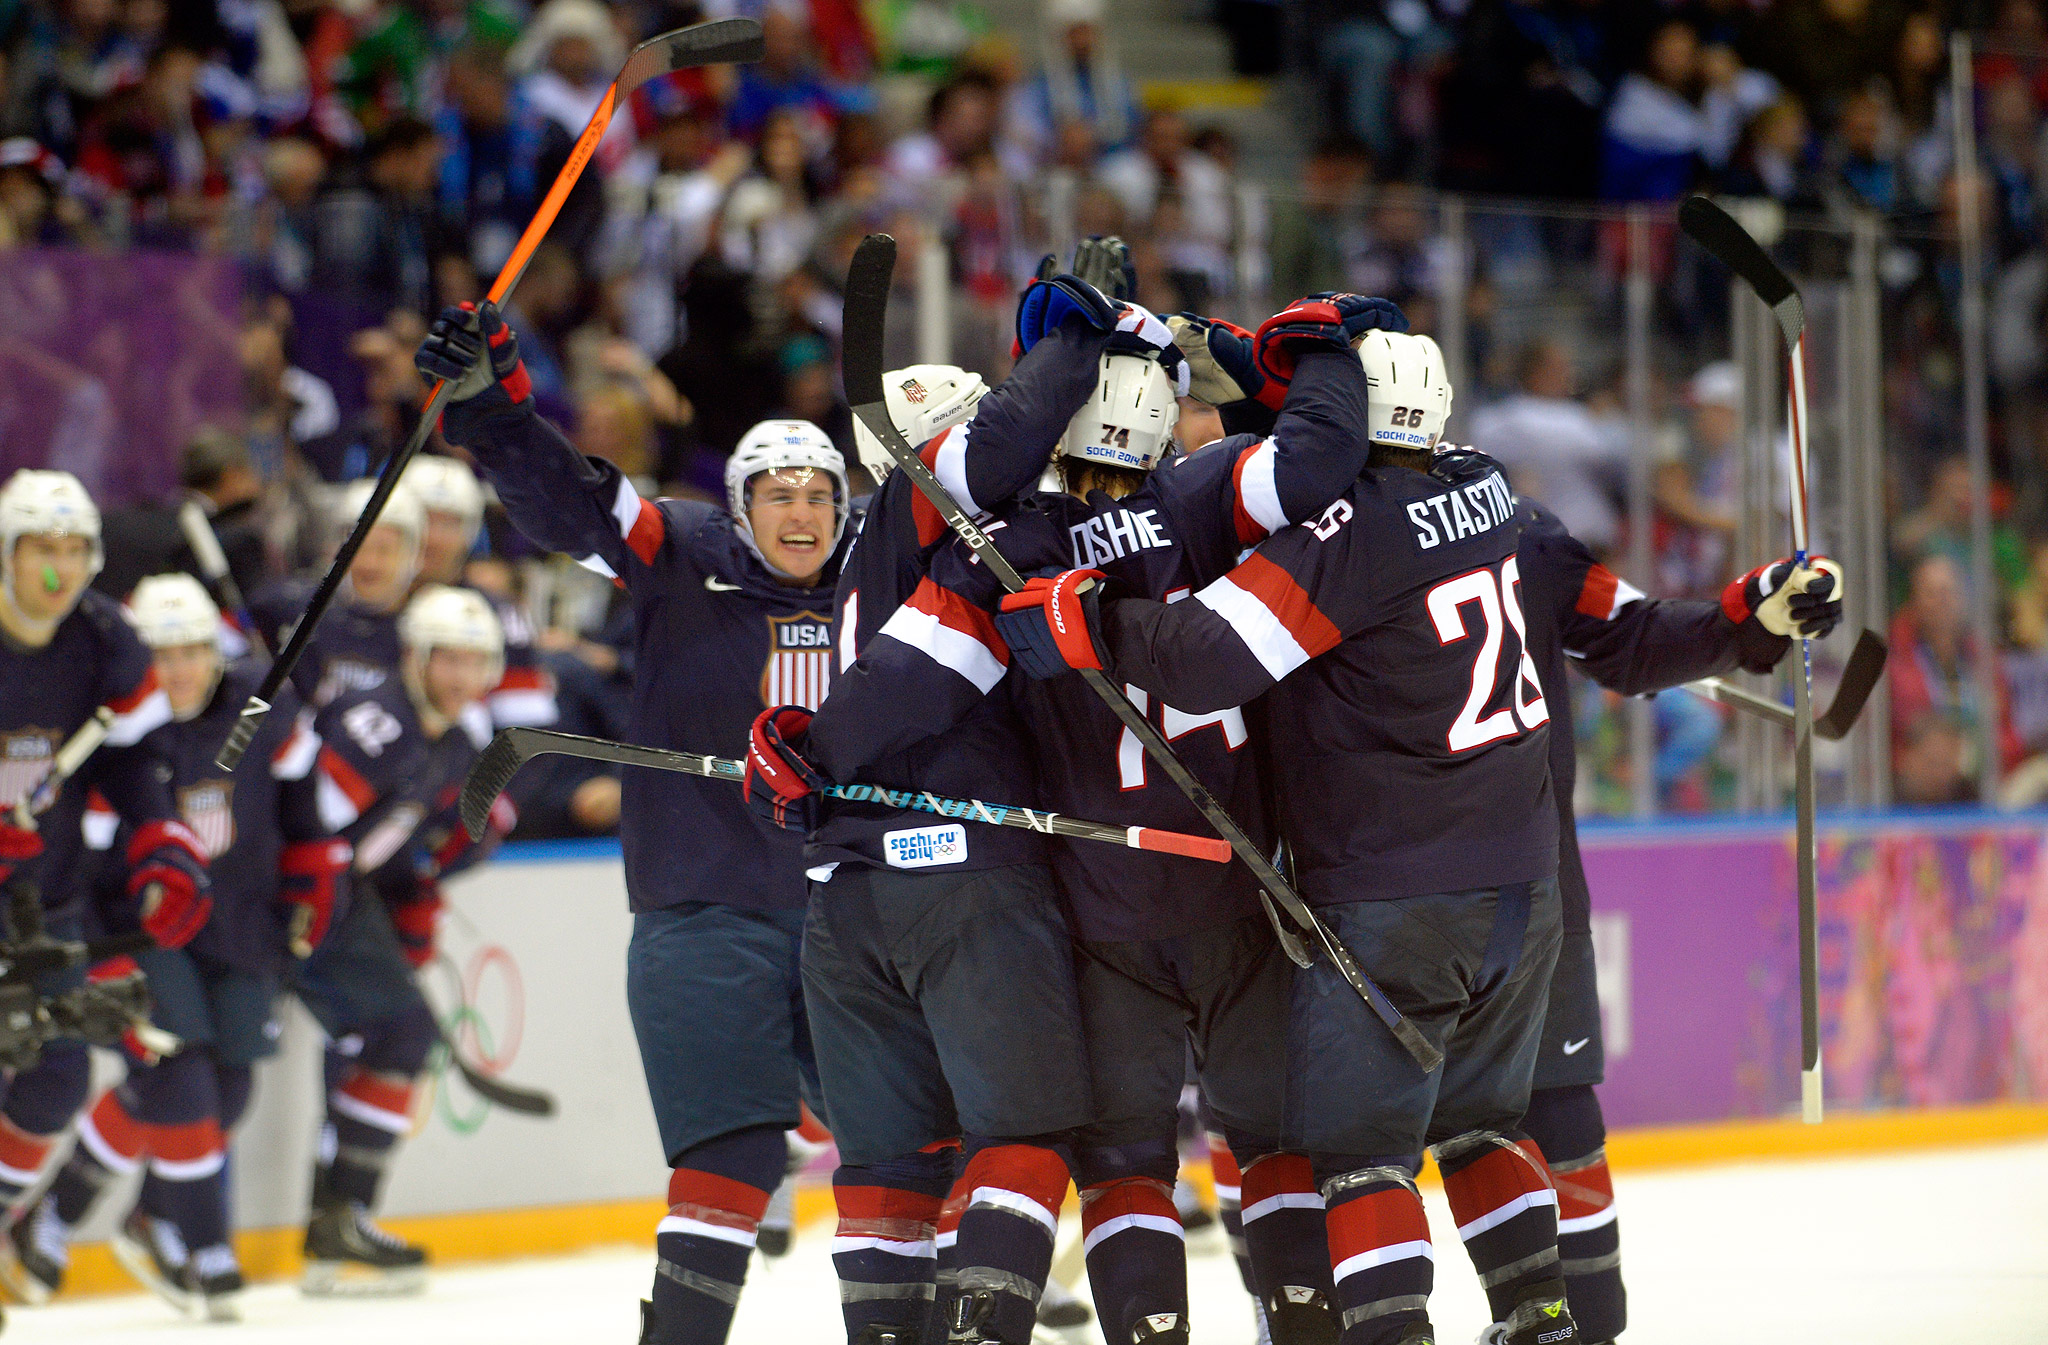 US Hockey Team celebrates shootout win over Russia